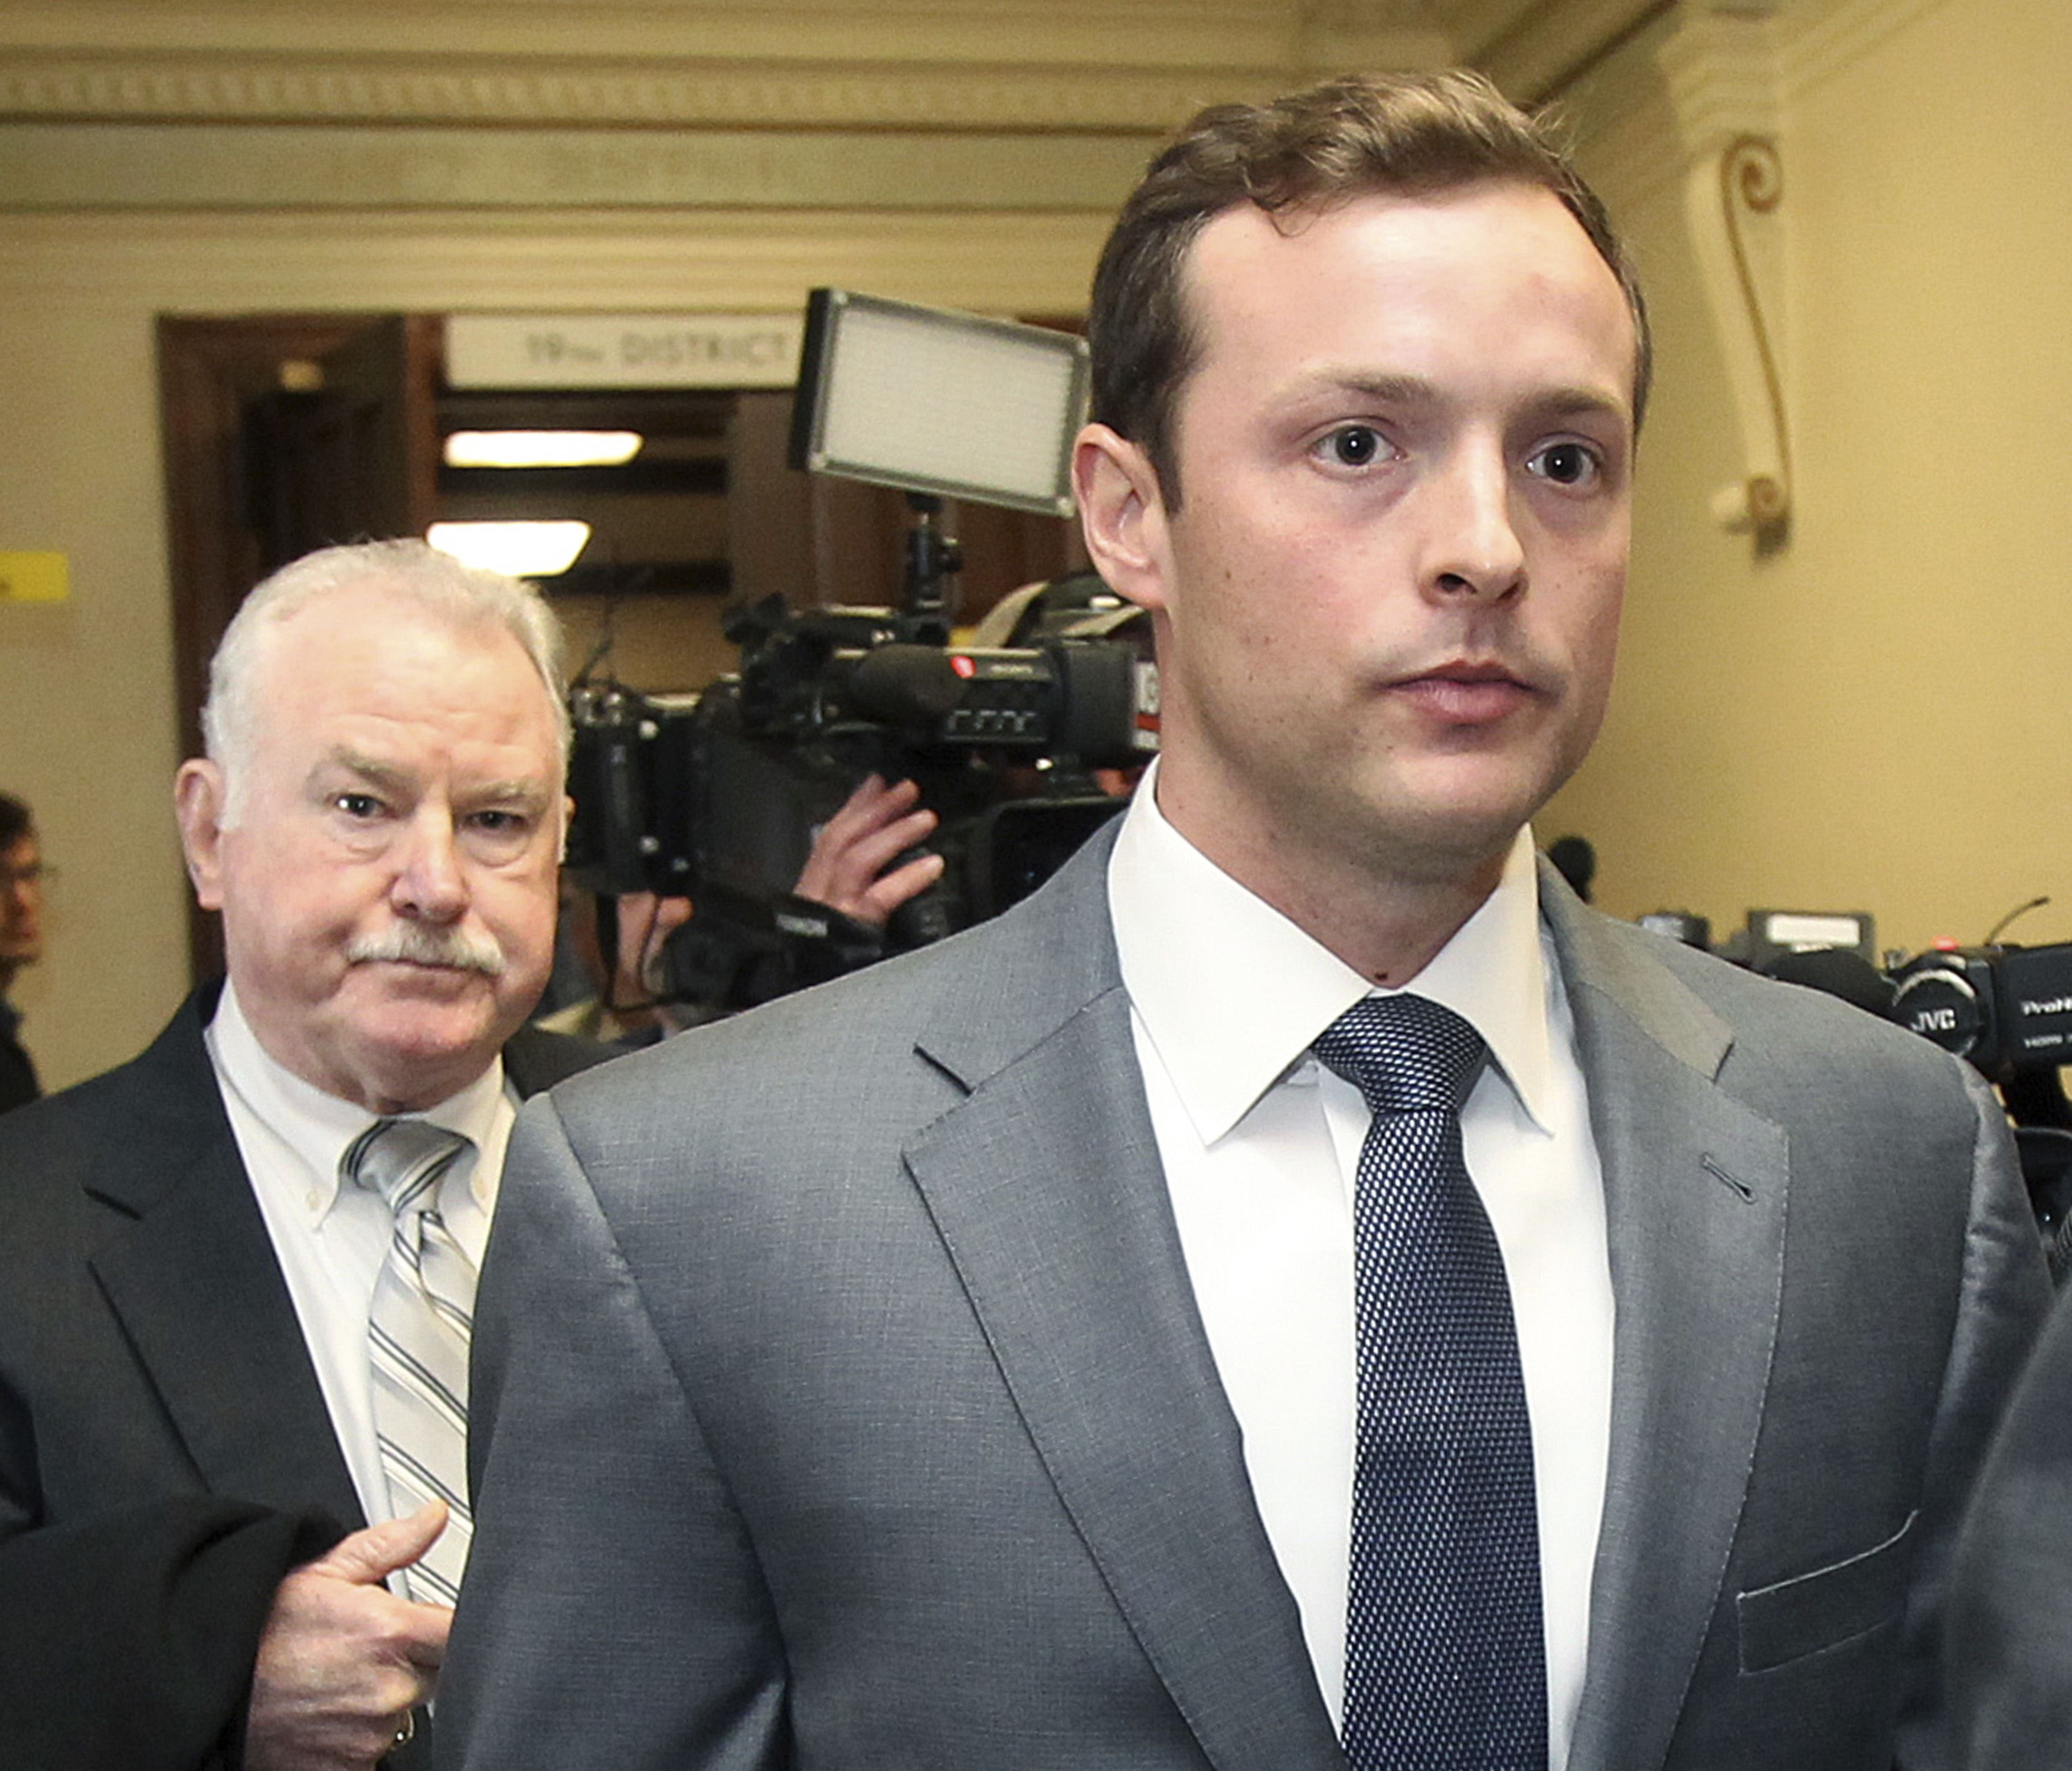 Outrage Grows Over Baylor Rape Plea Deal